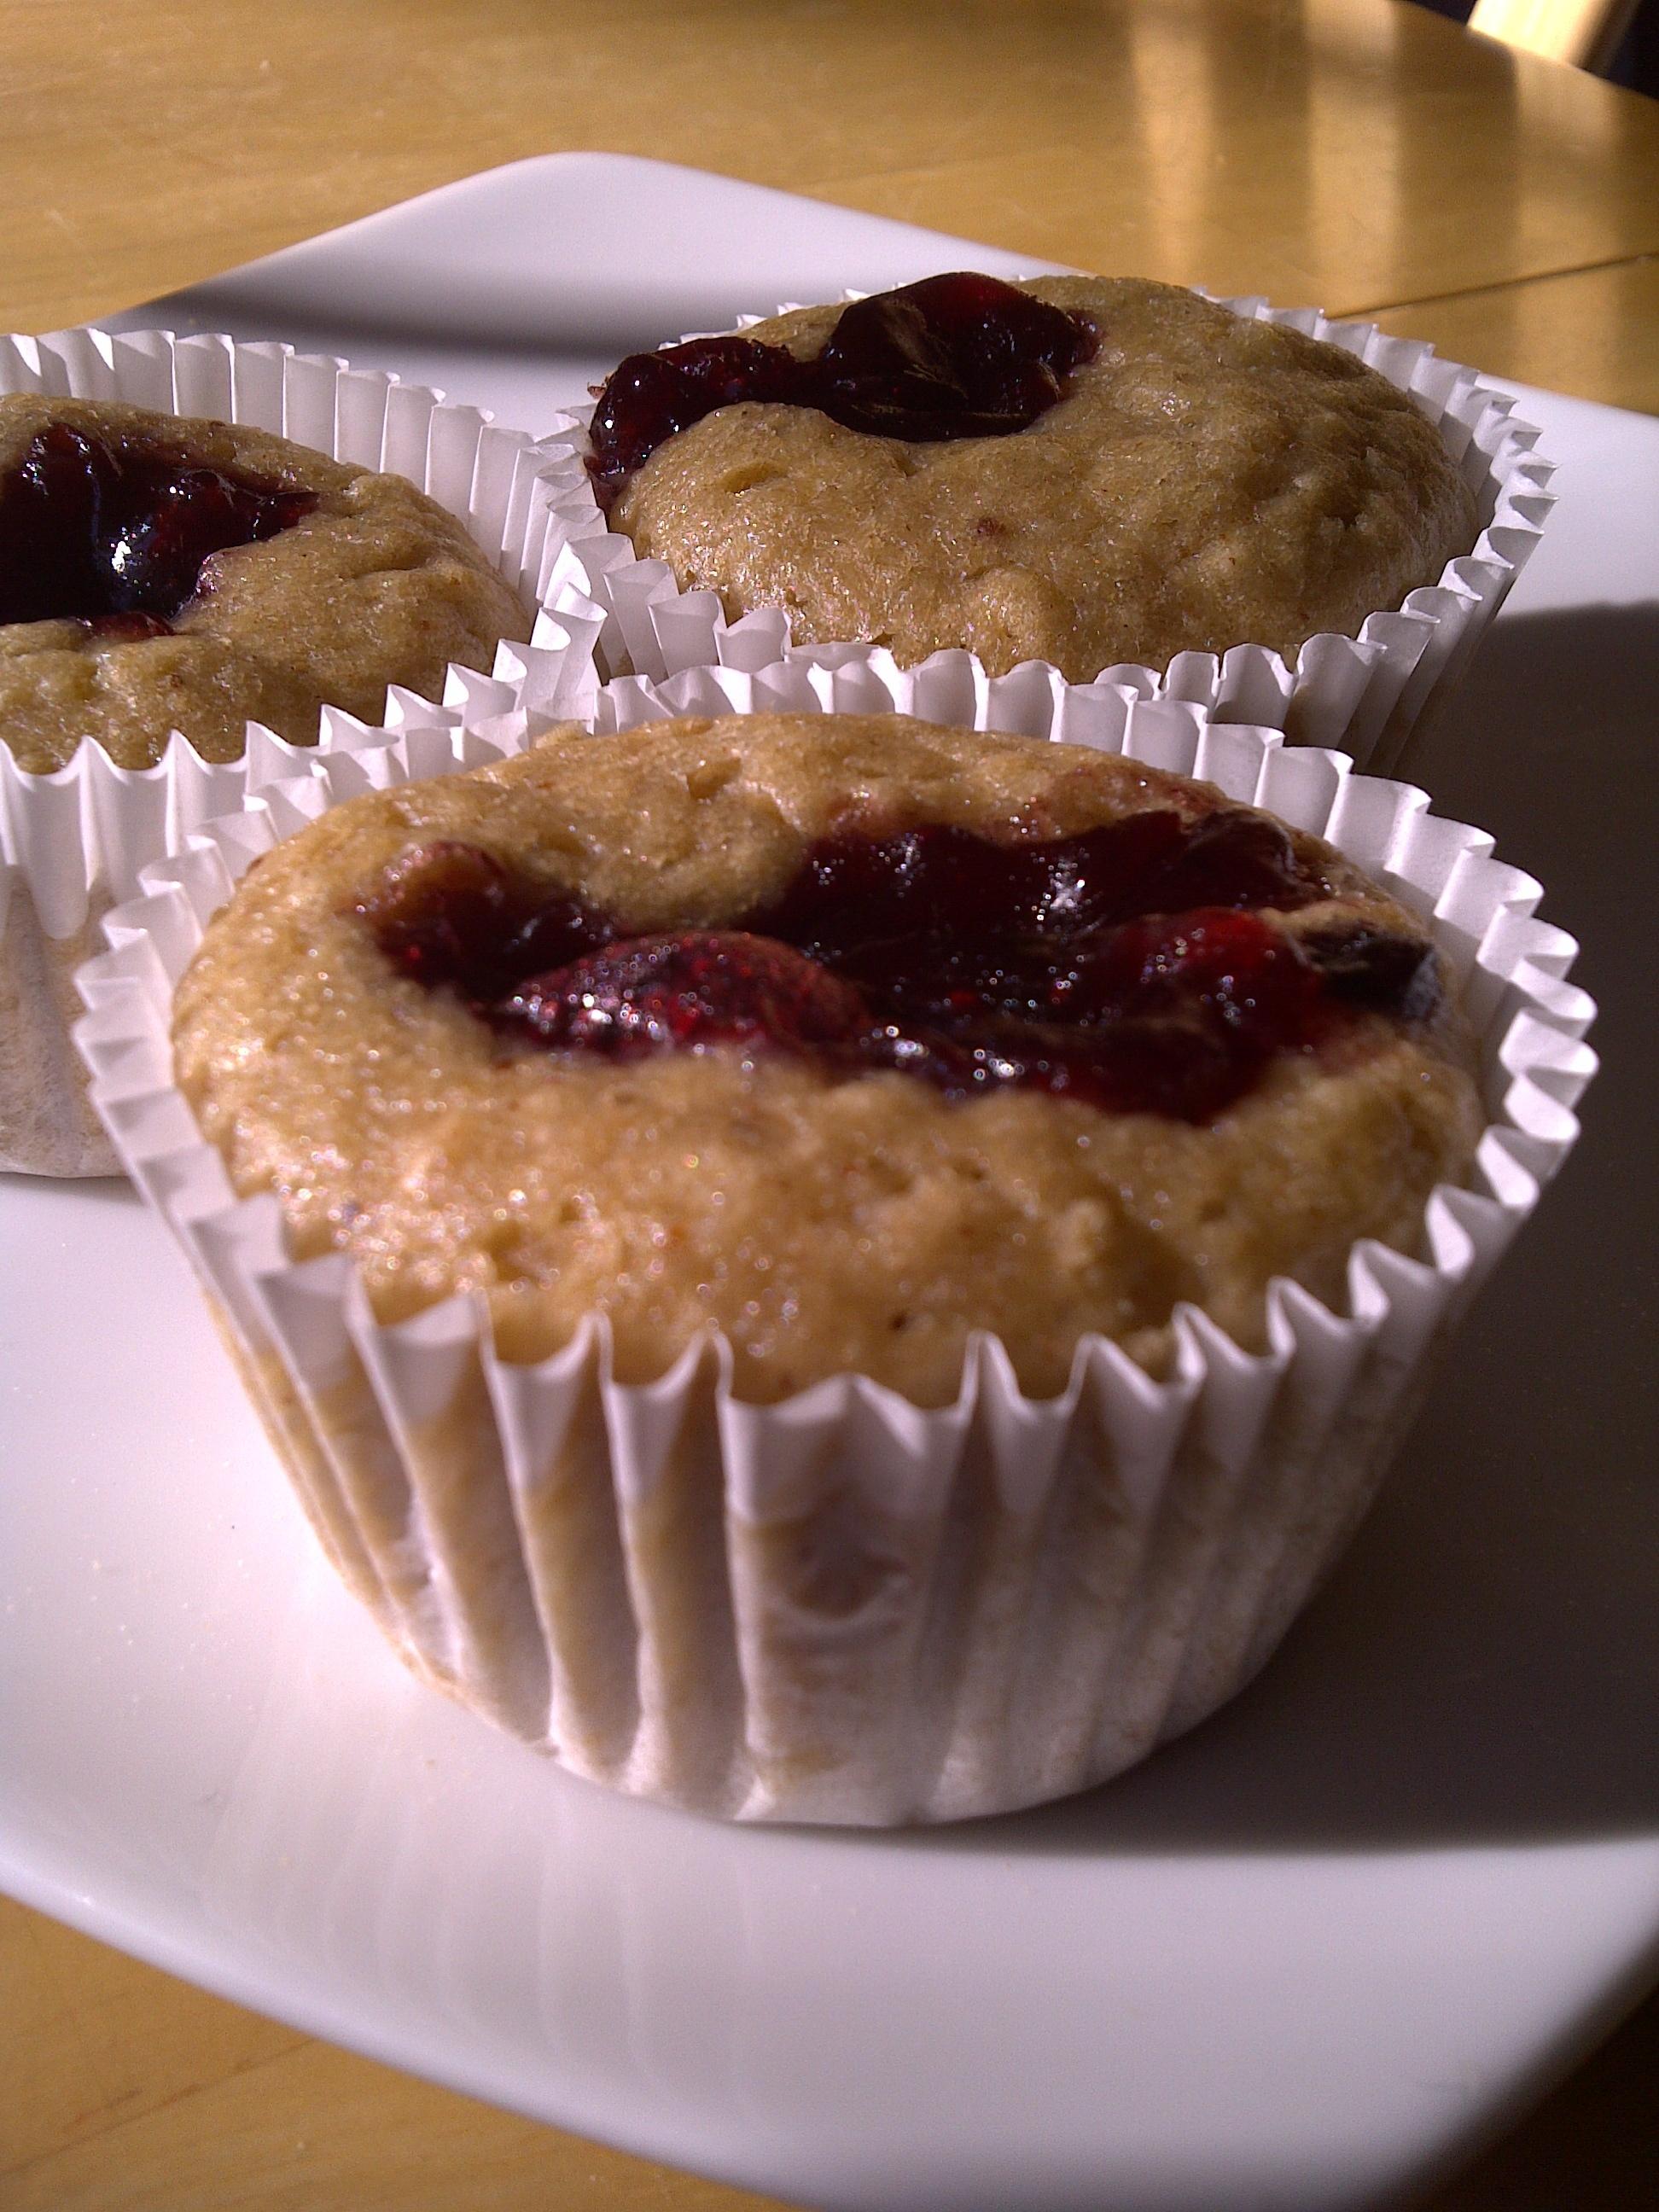 Jelly Donut Cupcakes | Health Freaxs Unite!